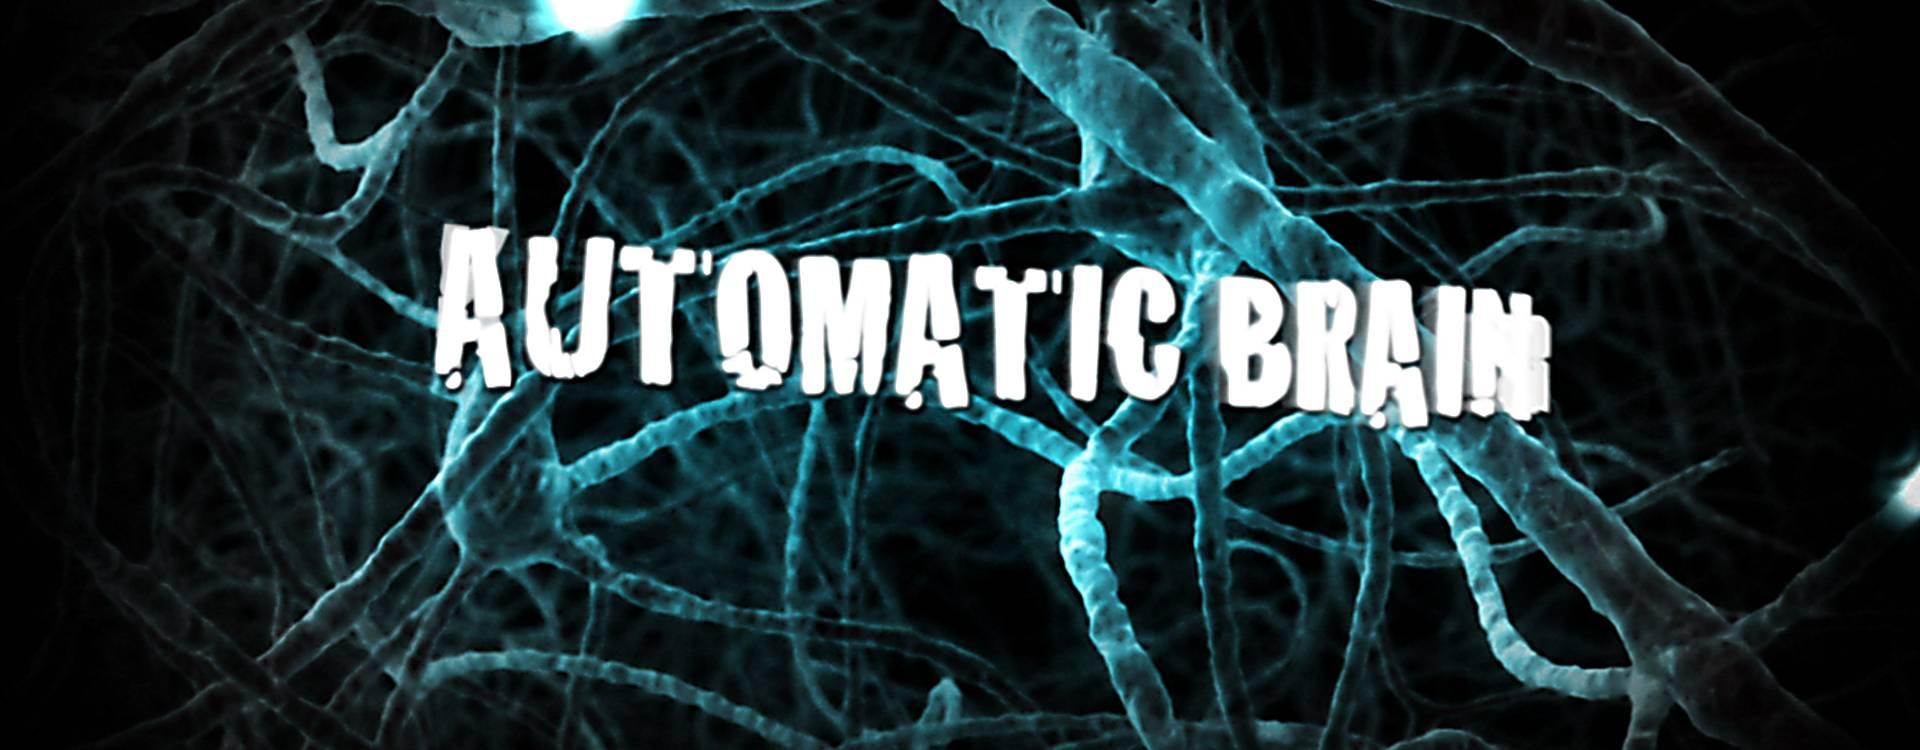 Automatic Brain-Banner